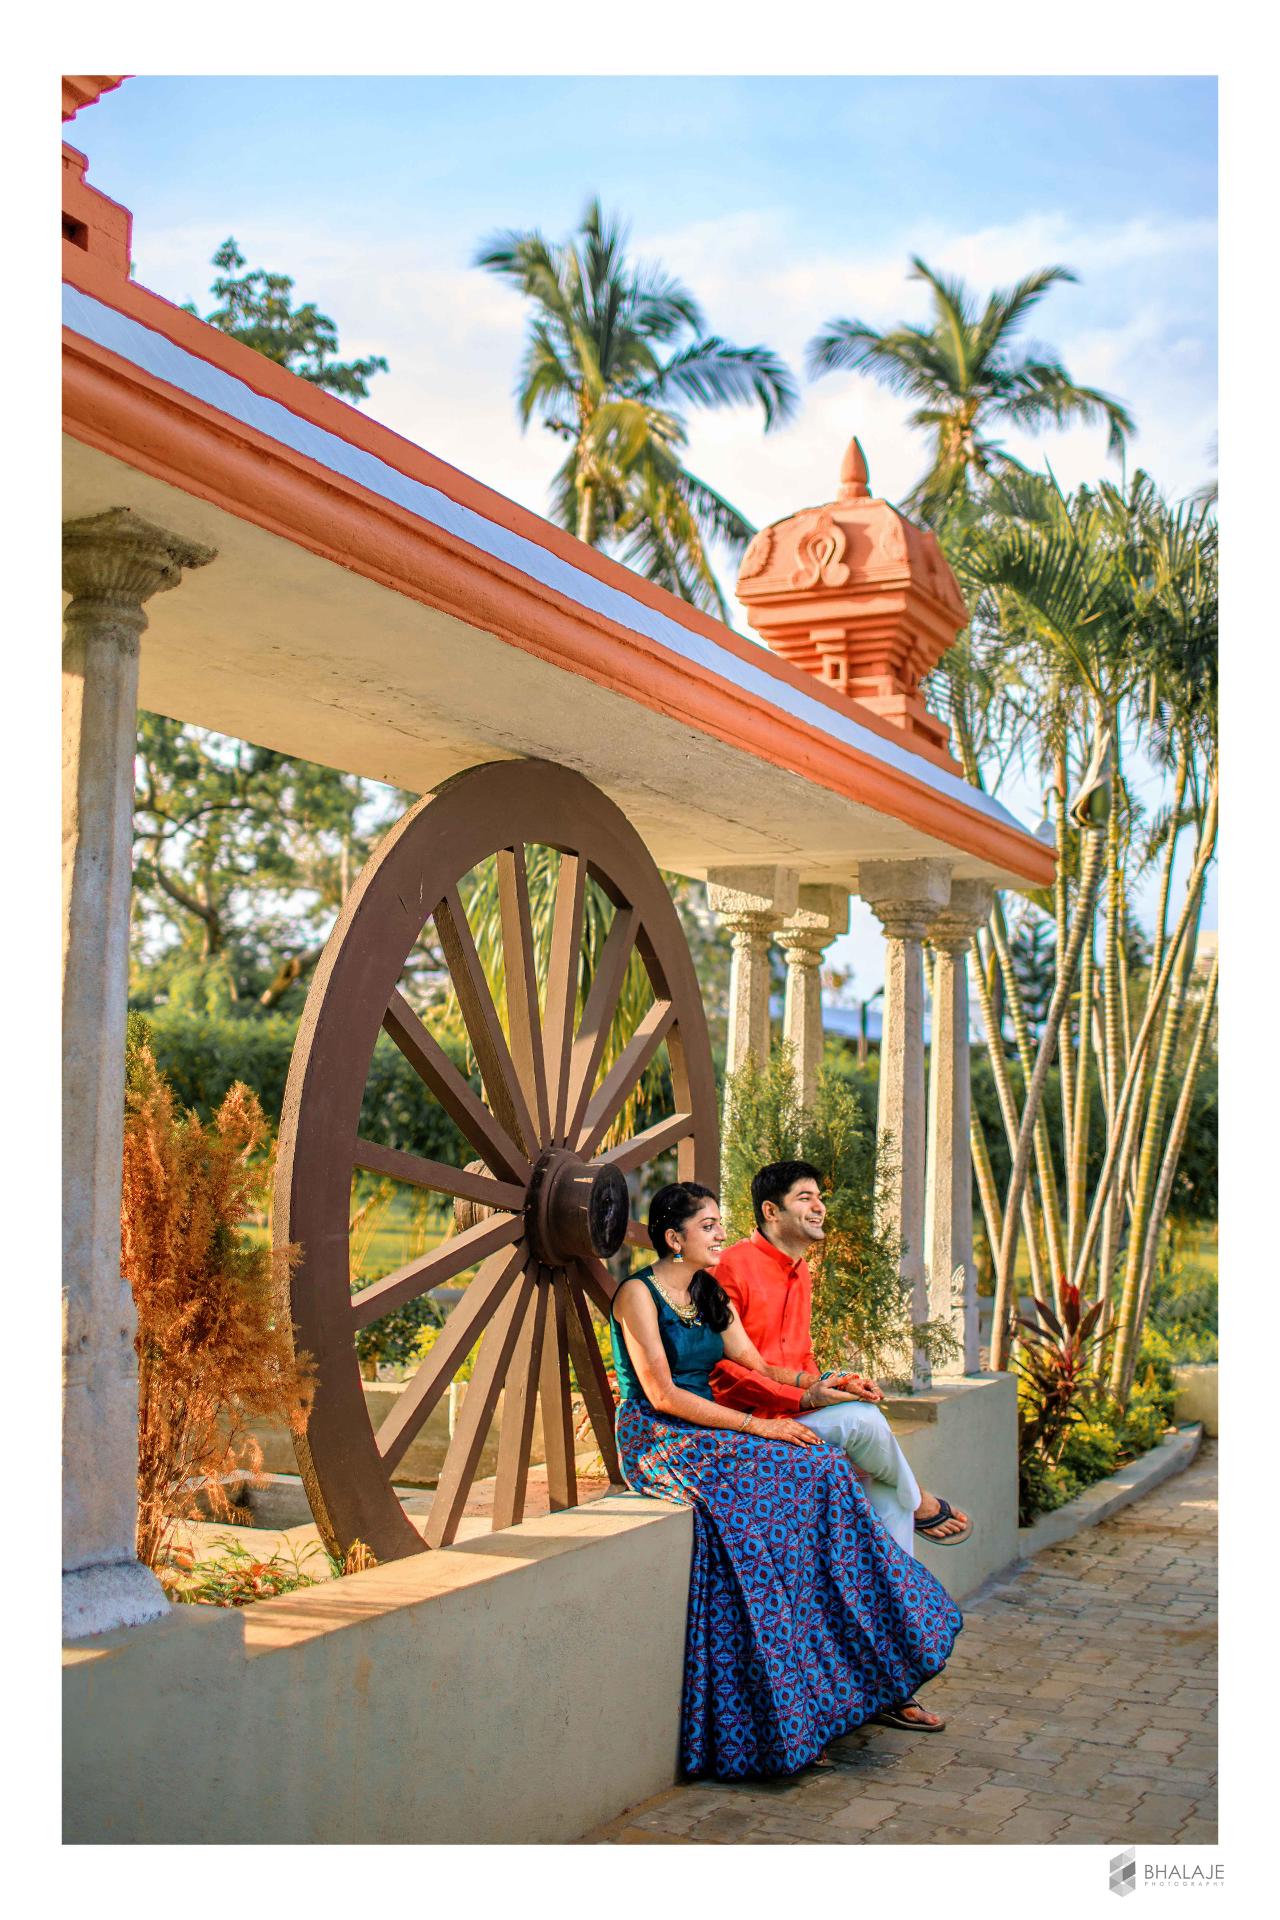 Tam Bram Wedding Photography, Telugu Brahmins Wedding Photography, Outdoor Wedding Photography, Malayali Brahmin Wedding Photography, Kannada Brahmin Wedding Photography, Manhwa brahmin Wedding Photography, Inter Caste marriage Photography, North Indian Wedding Photography